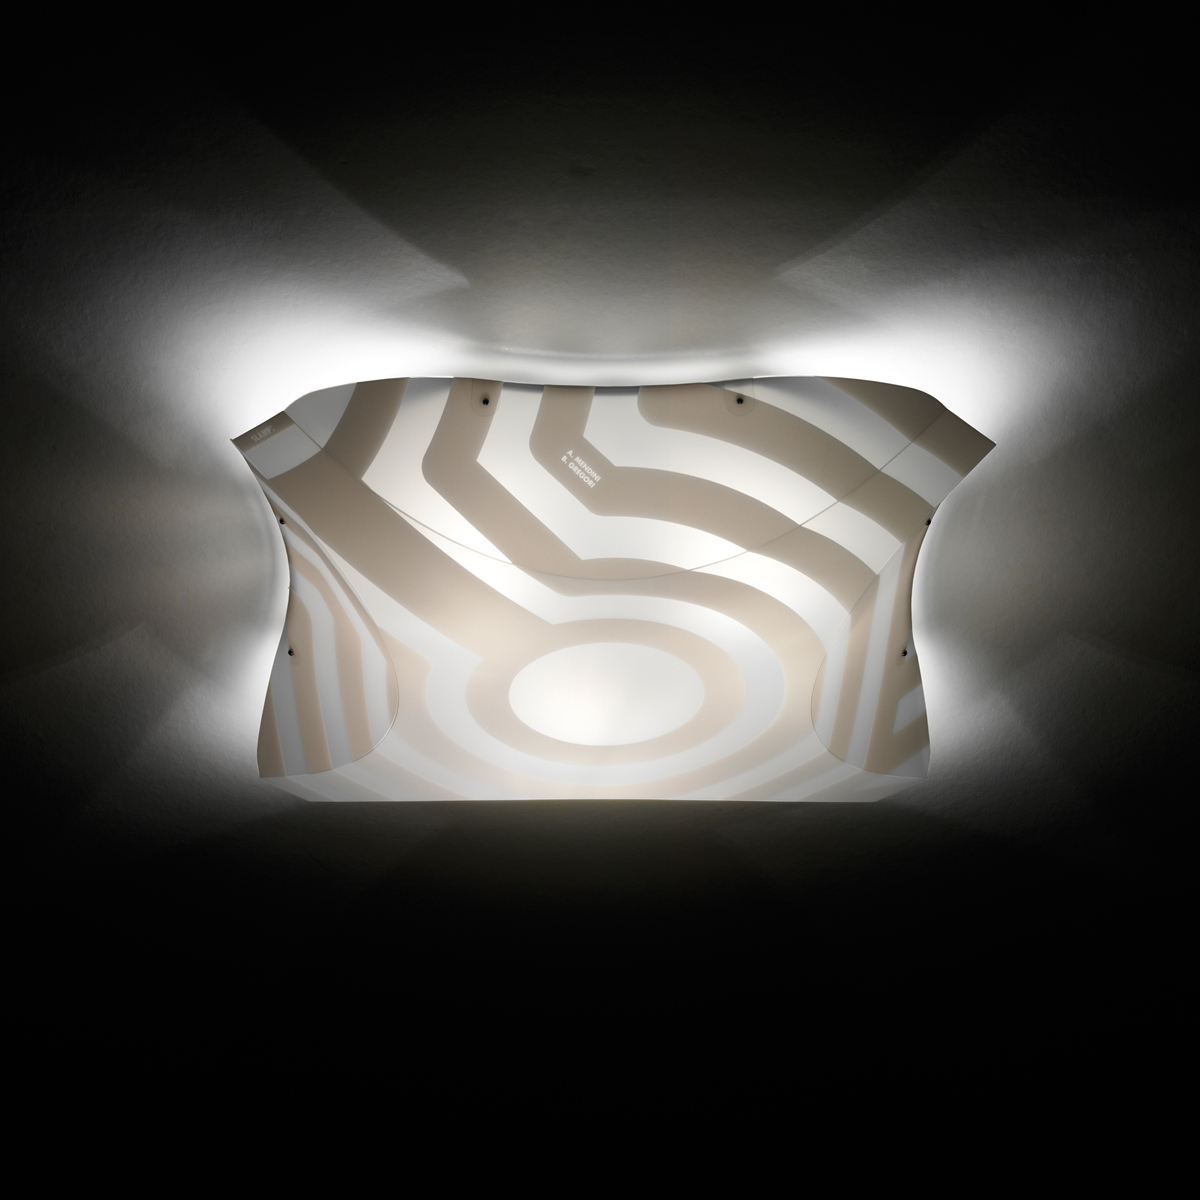 Venti Plana Small Wall Lamp